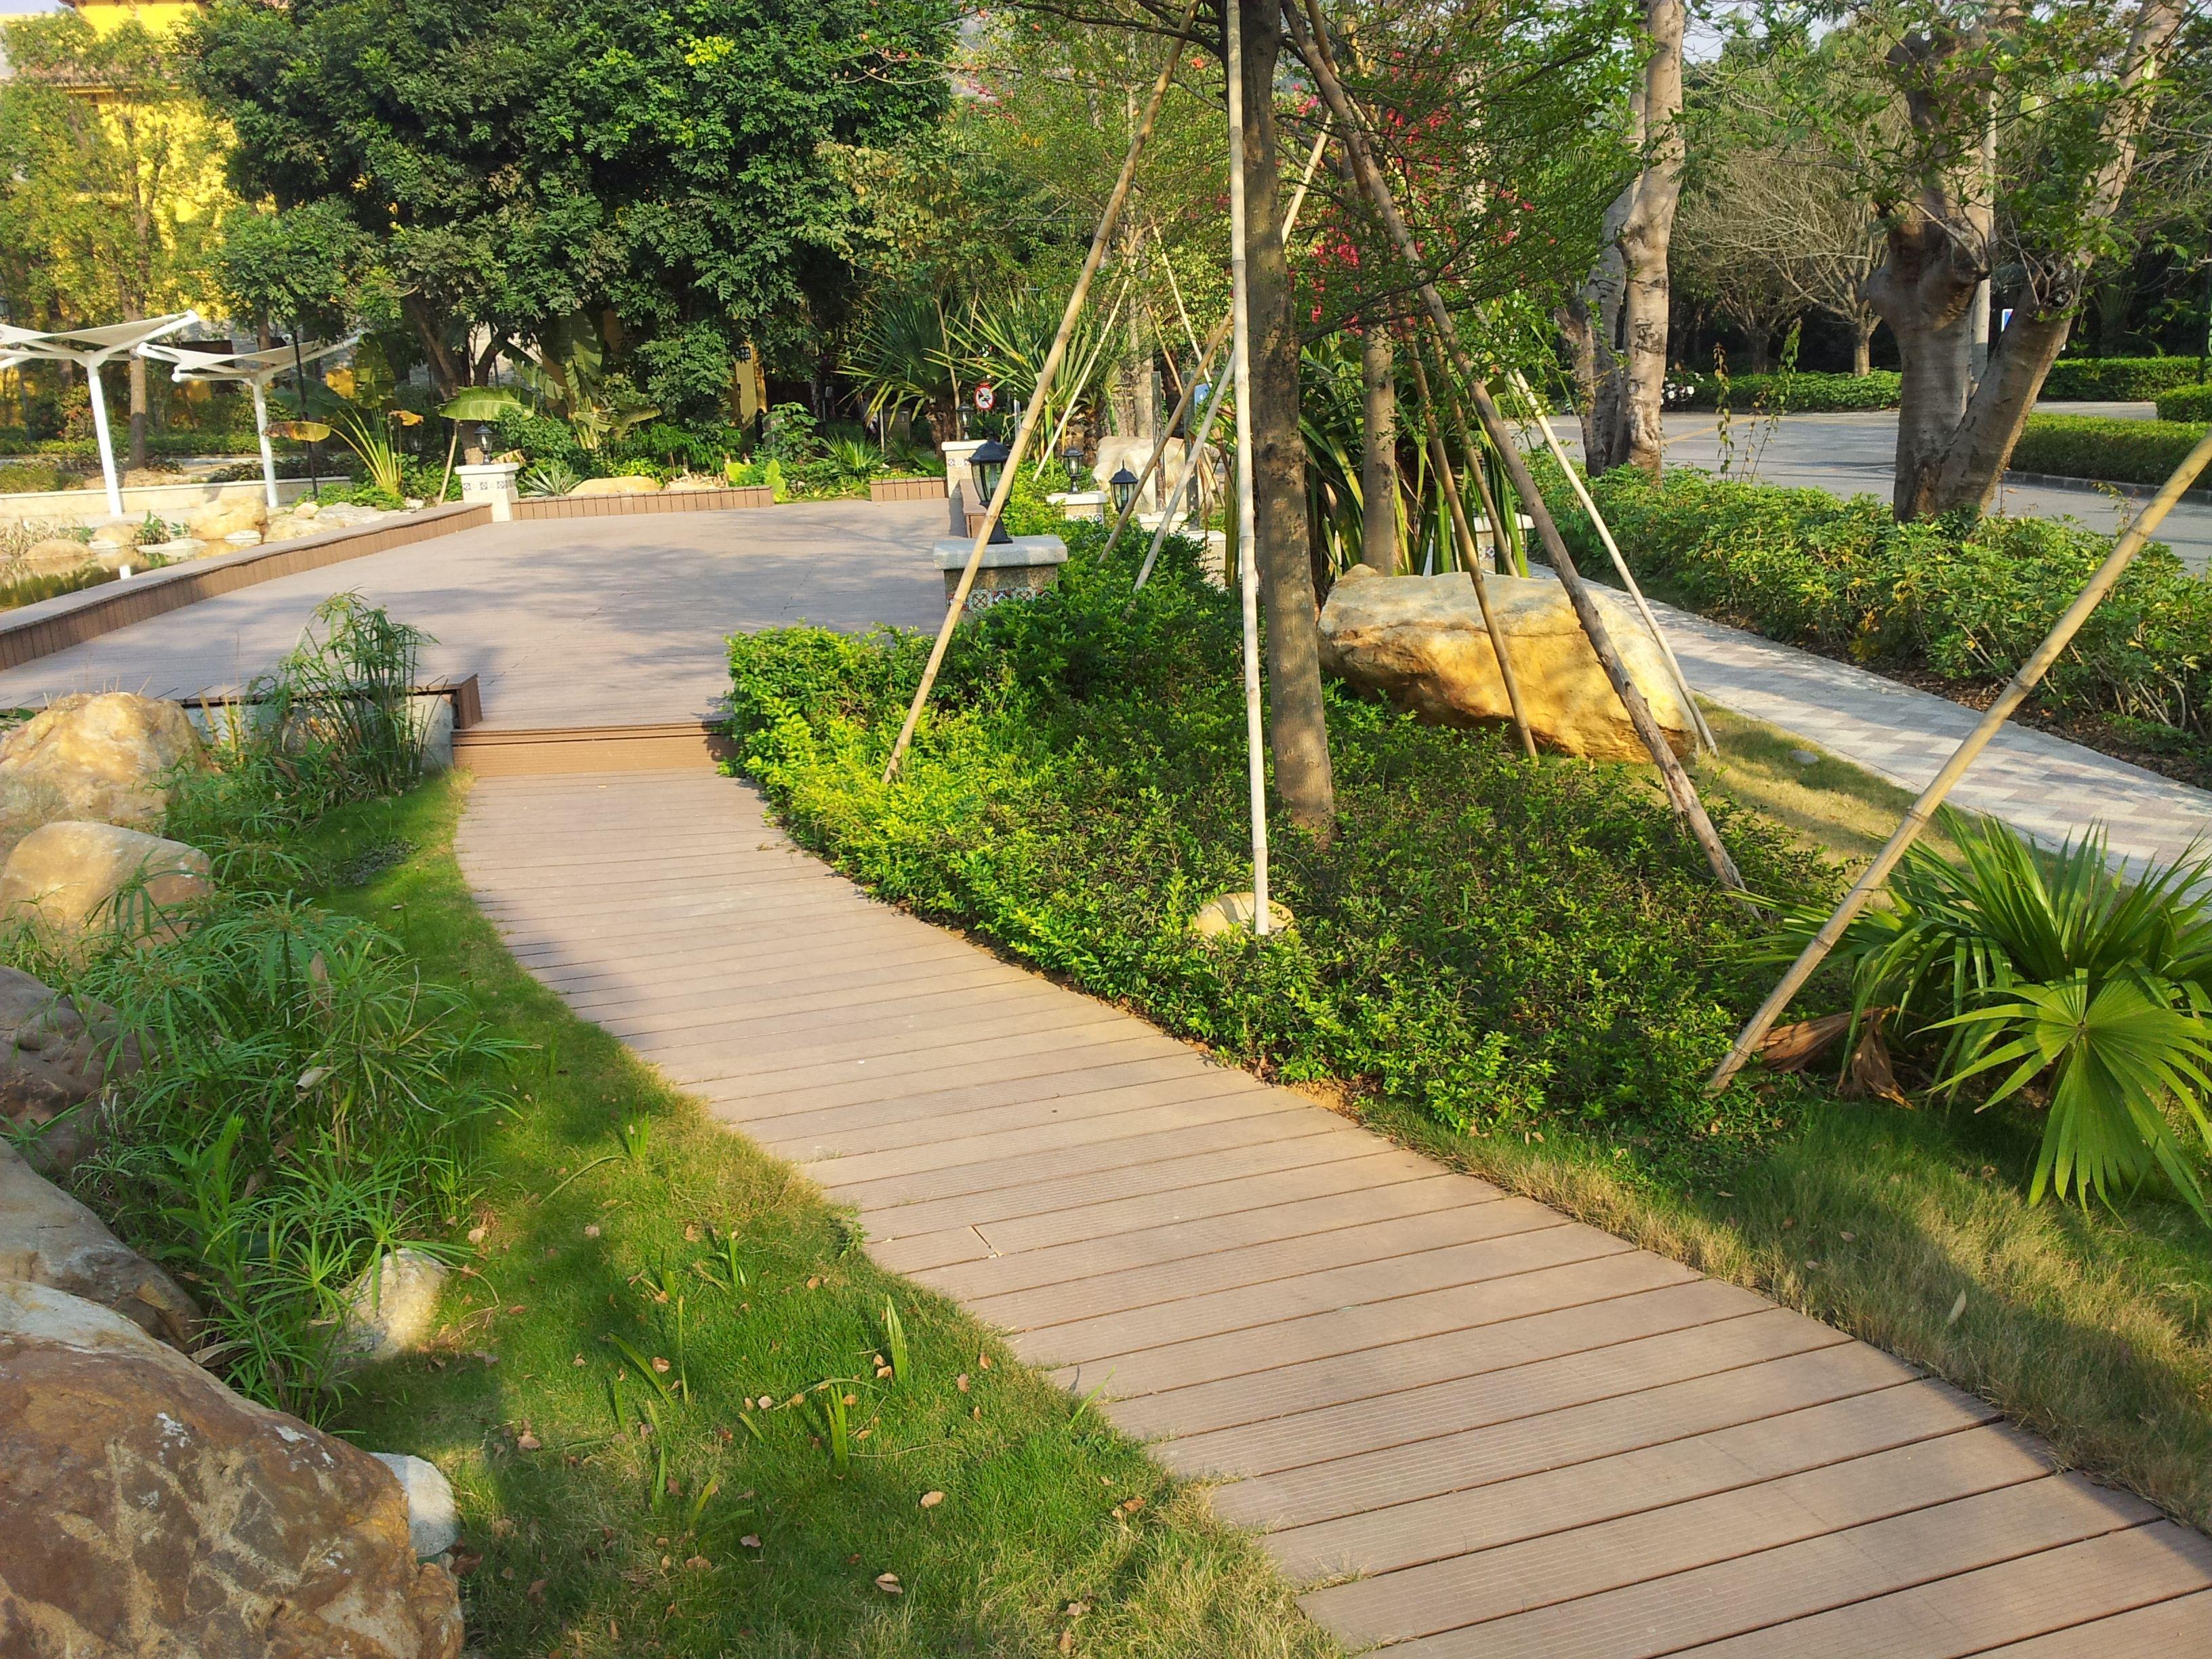 Timber Deck Supplier Sri Lanka 6x6 Deck Post Maximum Height Garage Flooring Malaysia Outdoor Wood Garden Floor Composite Decking